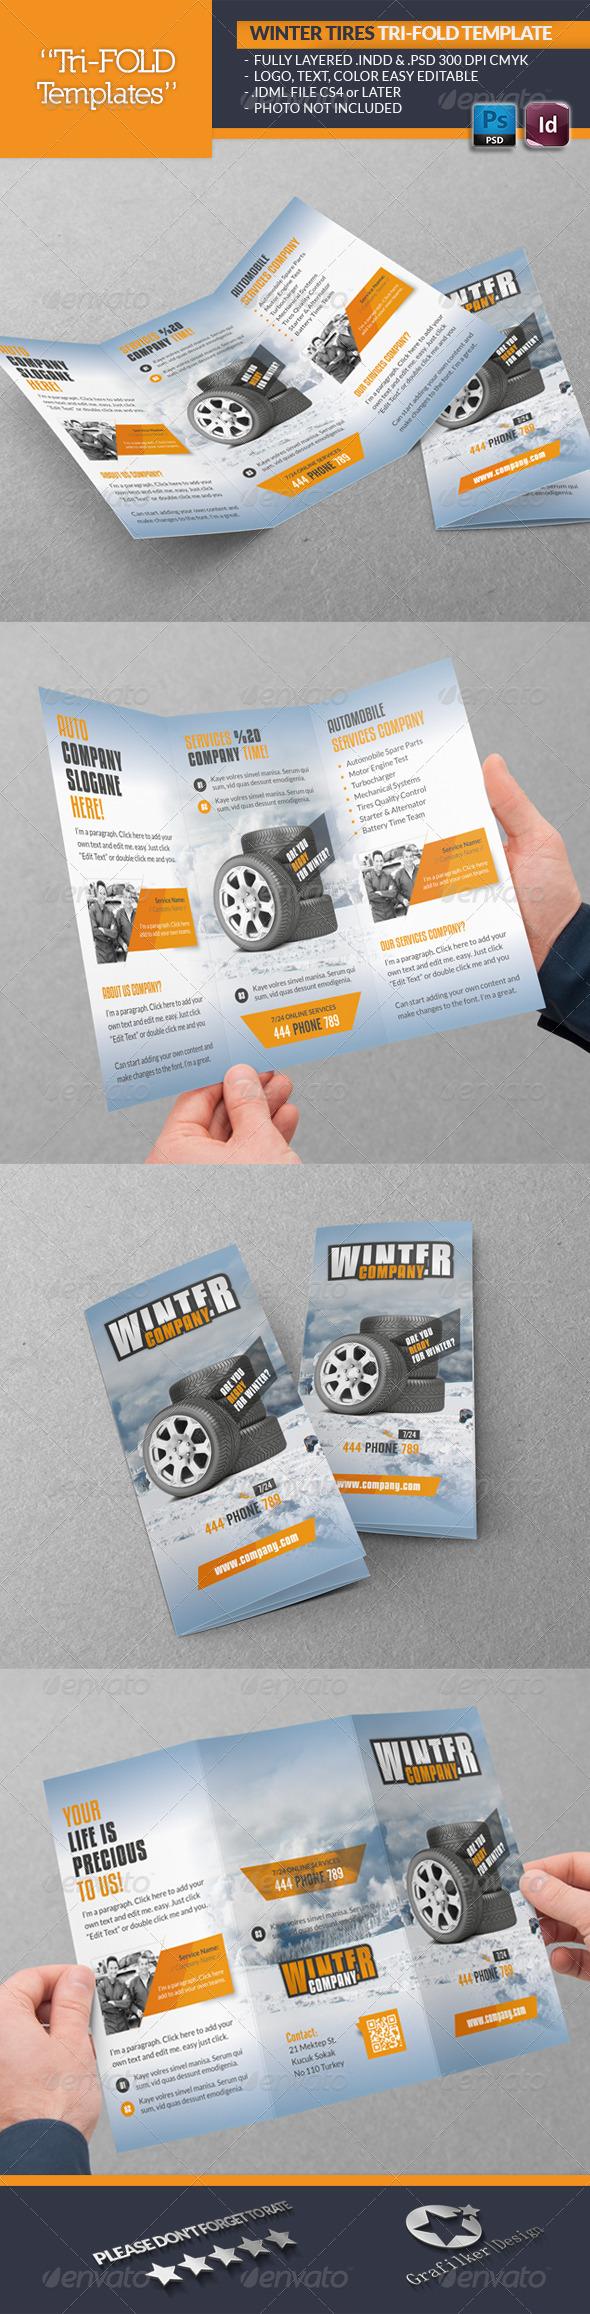 Winter Tires Tri-Fold Template - Brochures Print Templates